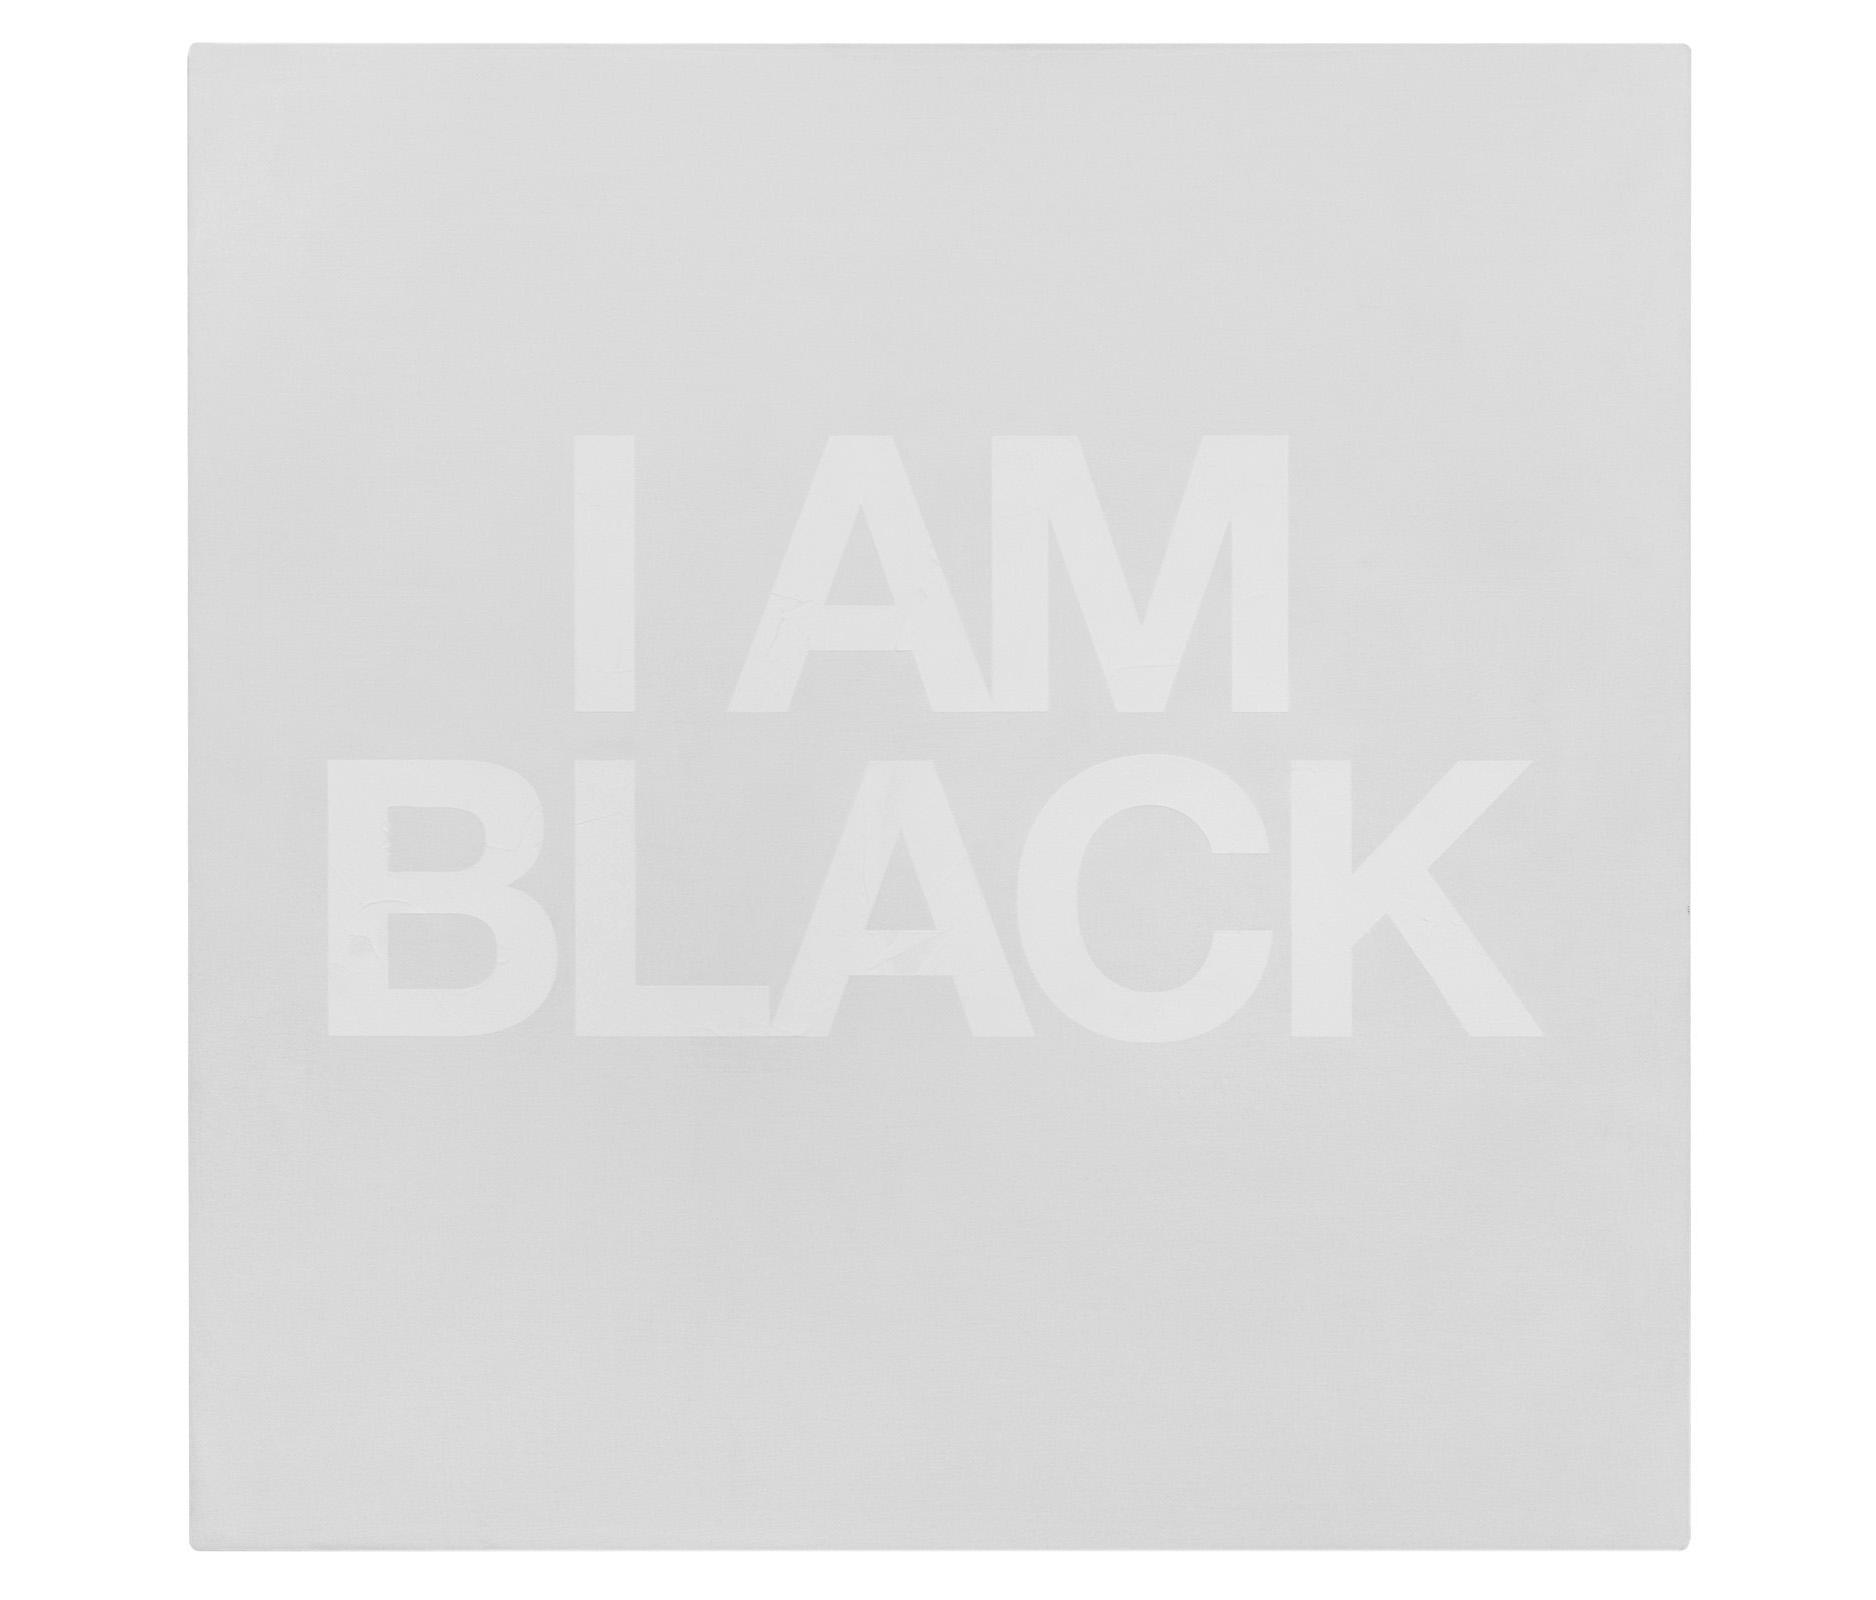 IAMBLACK-IG.jpg